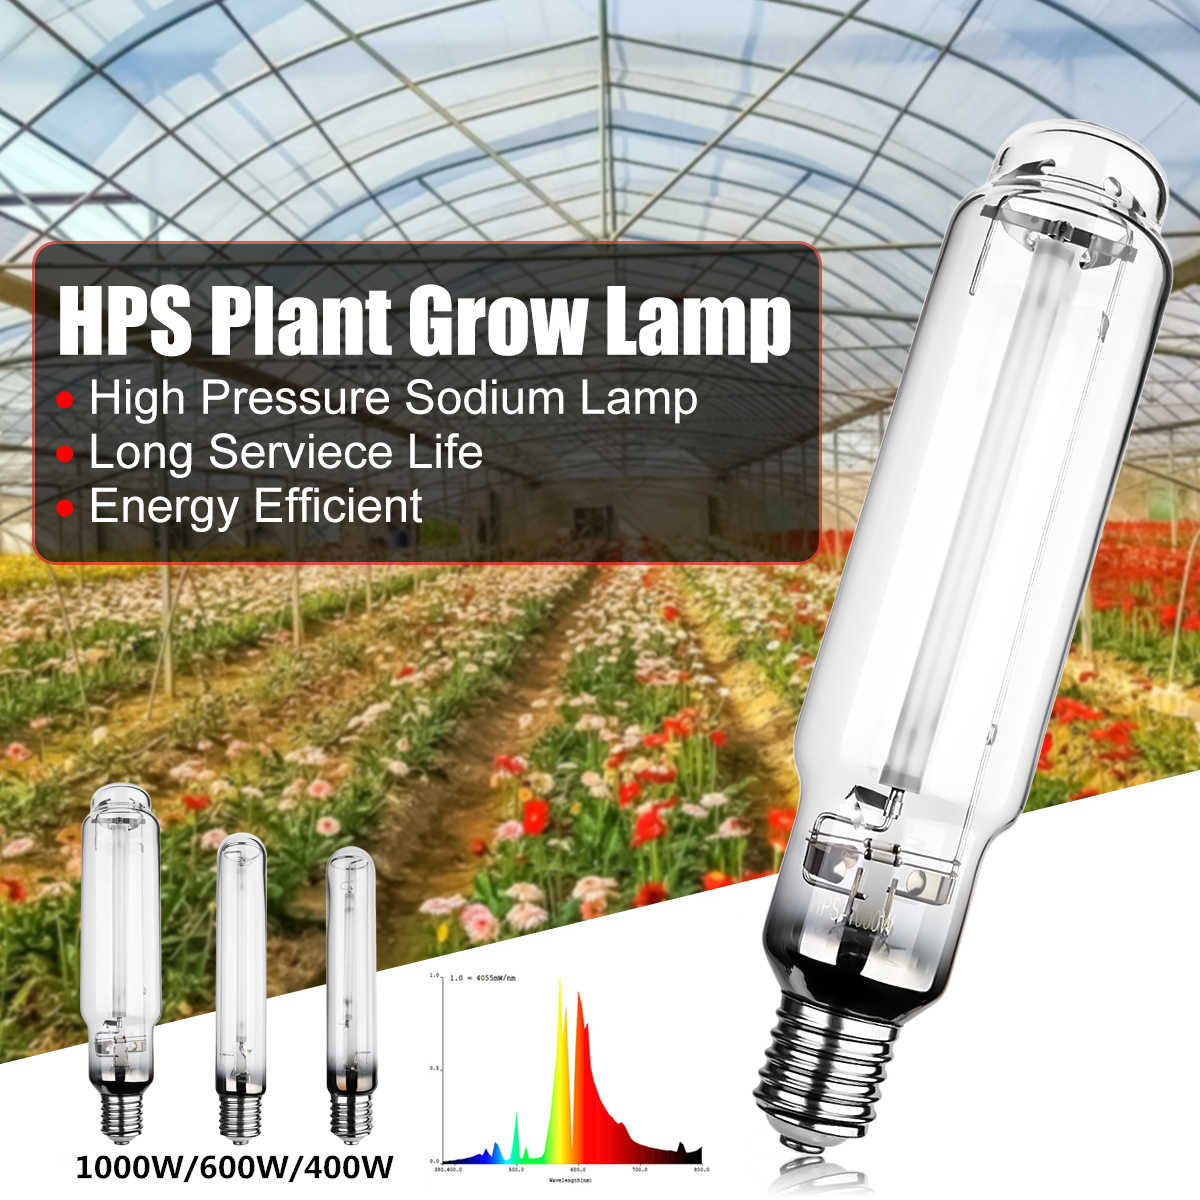 Smuxi E40 23Ra 400W 600W 1000W HPS Plant Grow Lamp High Pressure Sodium  Lamp Energy Efficient Long Service Life 23000 Hours